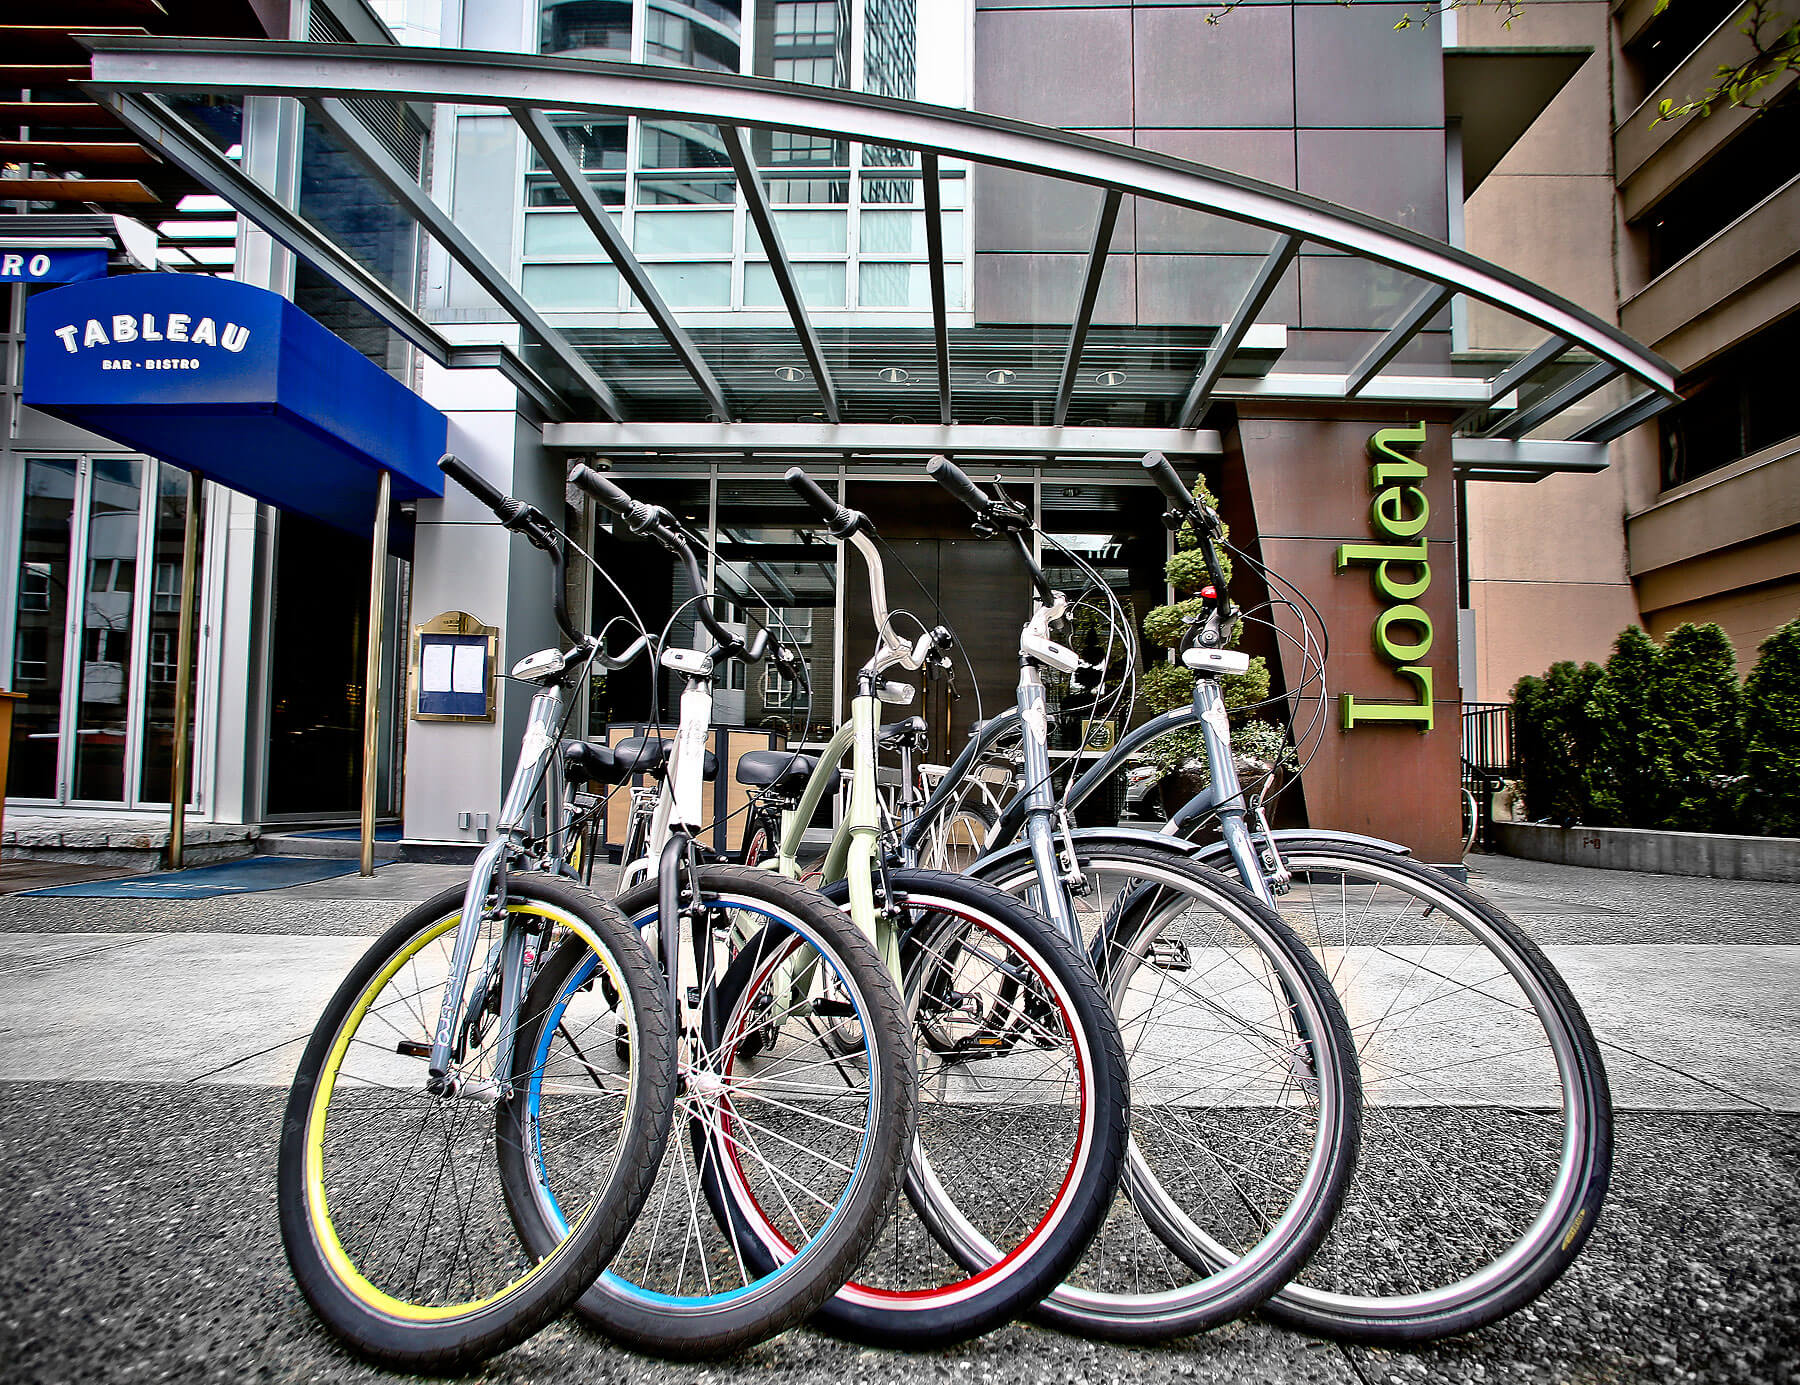 Loden-Cruiser-Bikes.jpg